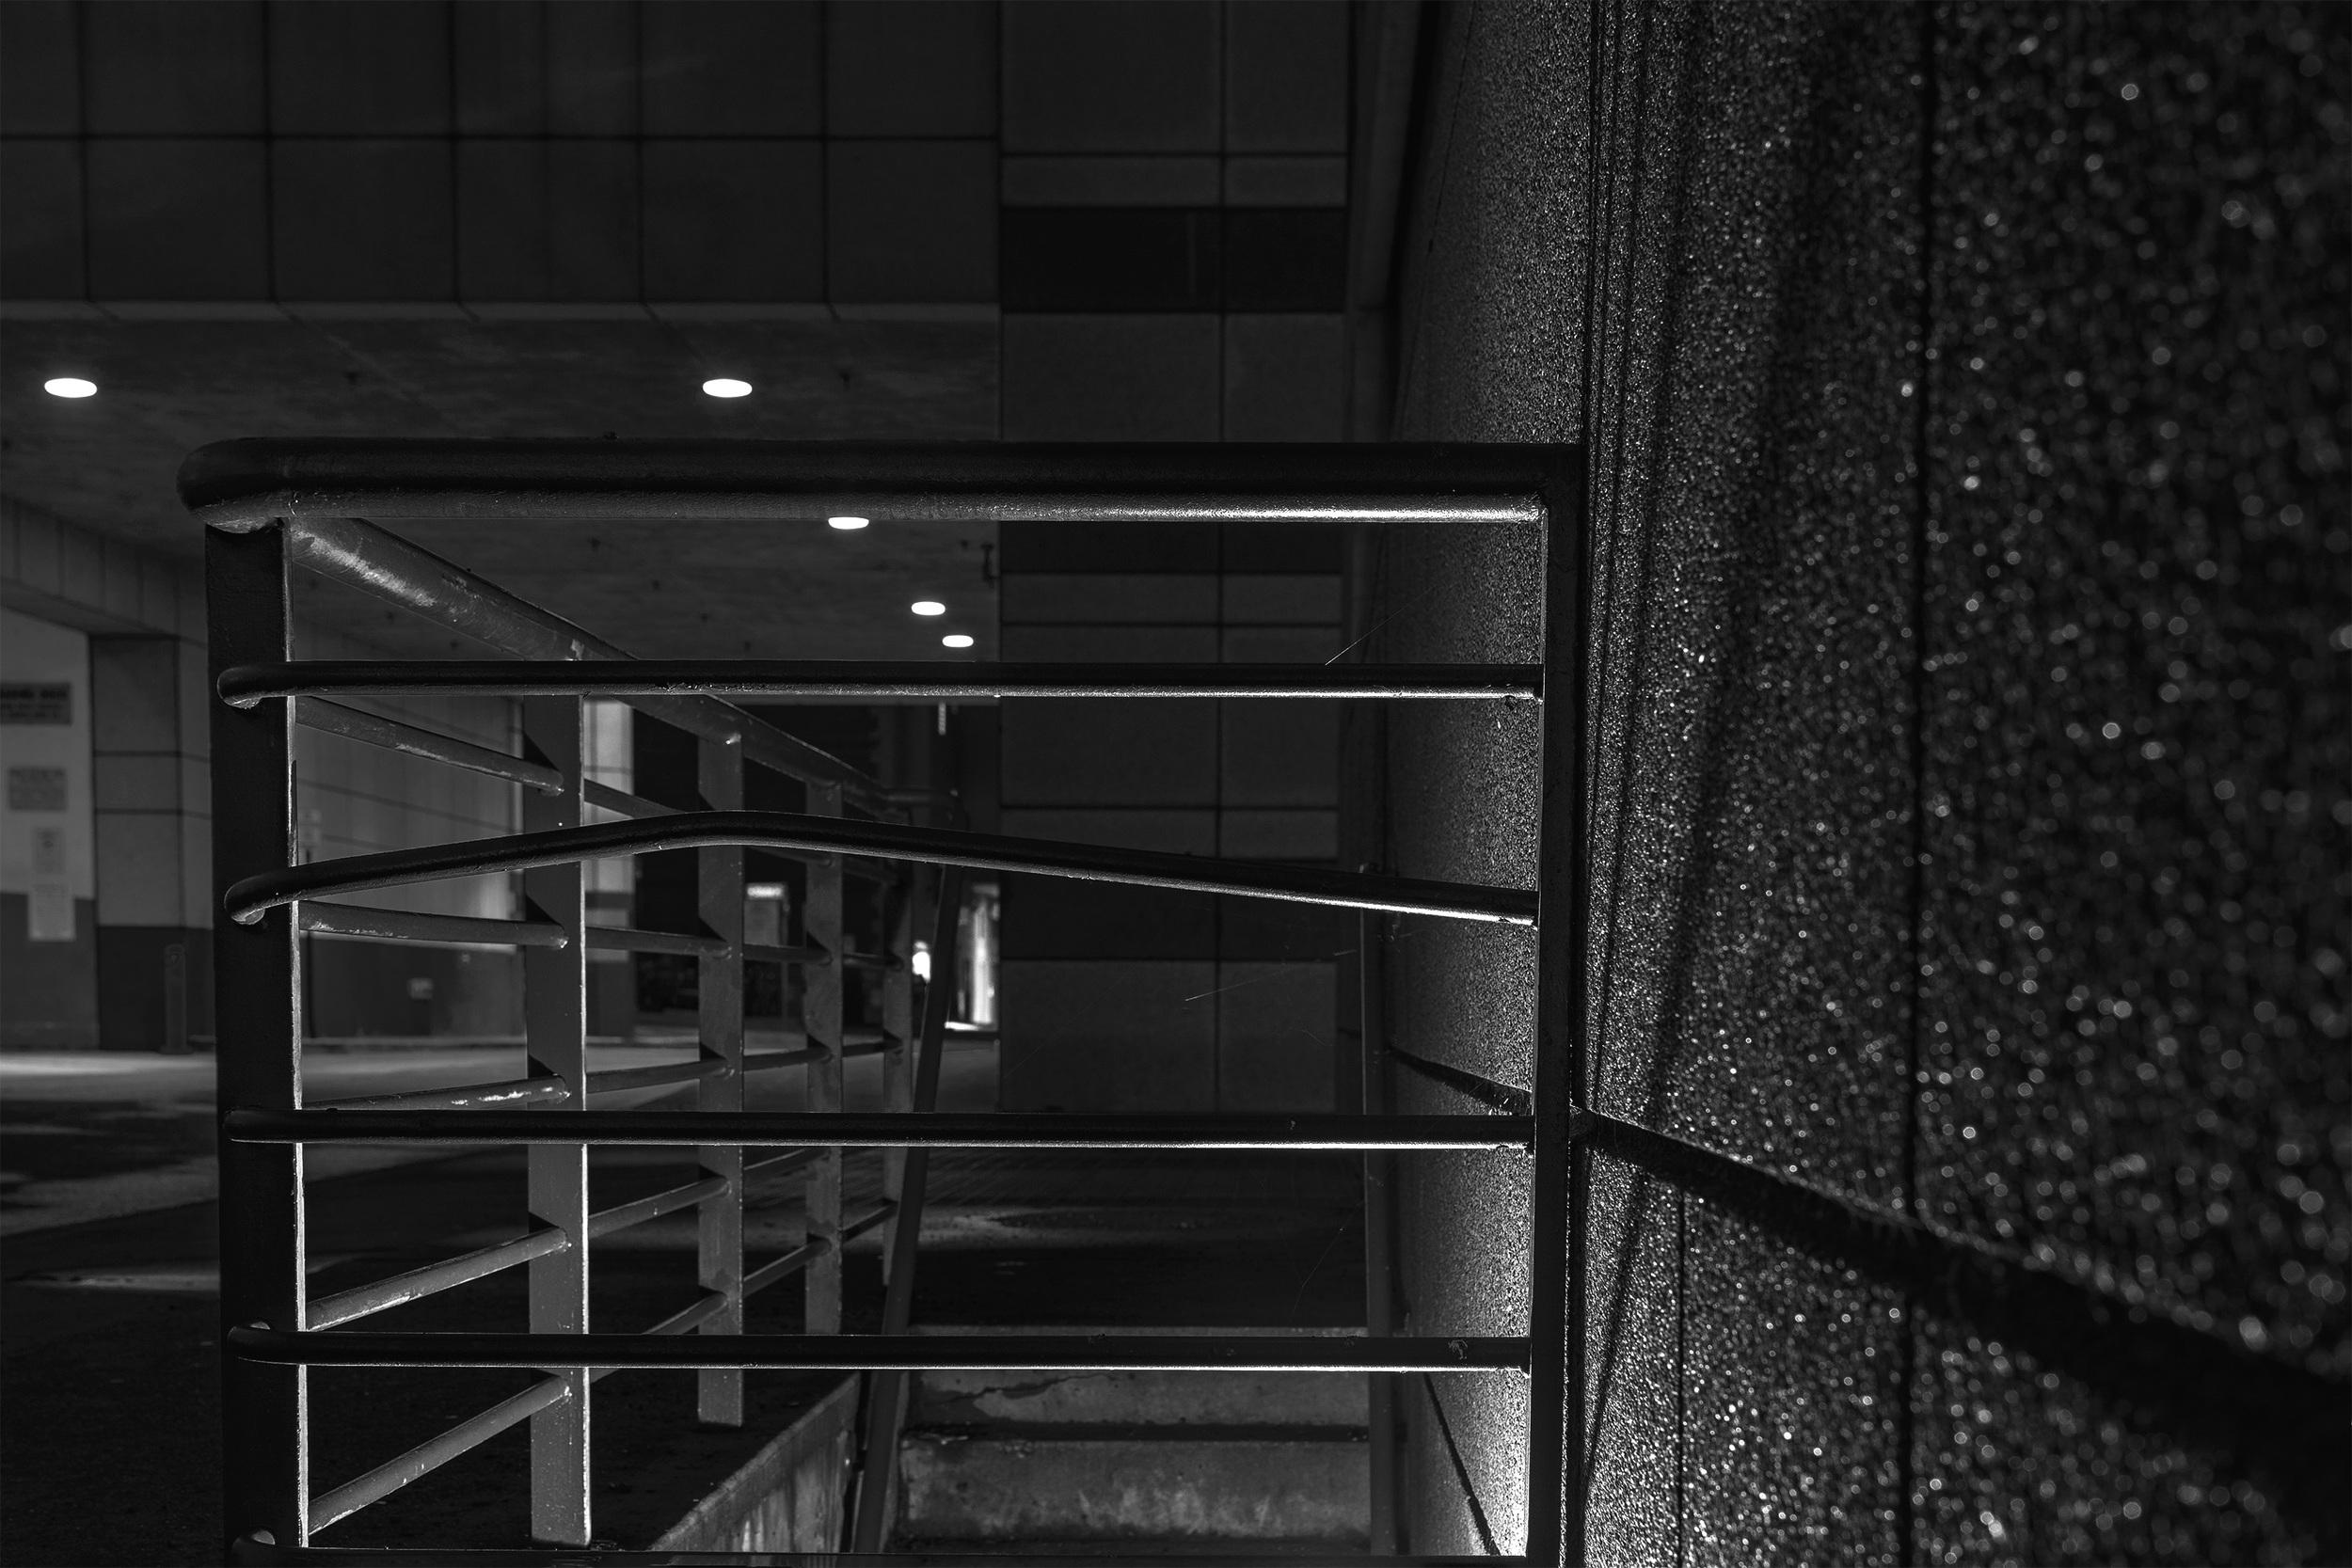 StairsLight_DSC2586.jpg